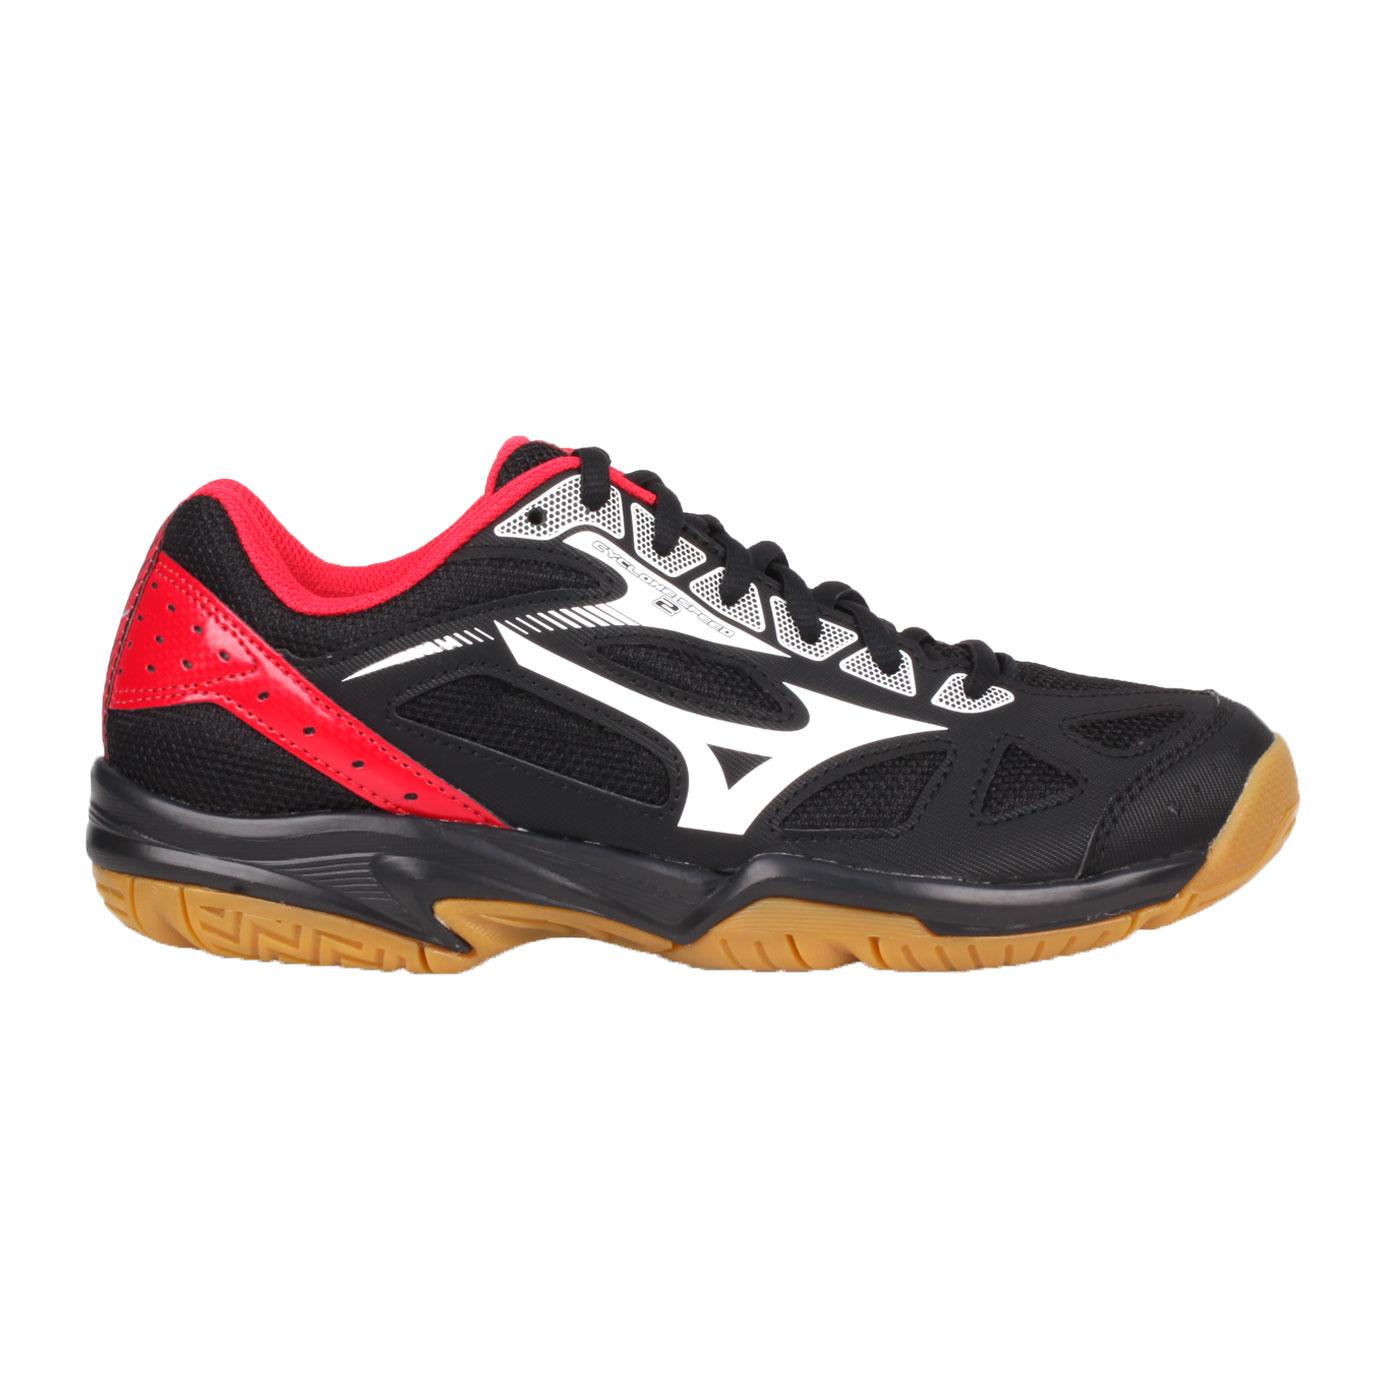 MIZUNO 排球鞋  @CYCLONE SPEED 2@V1GA198002 - 黑白紅